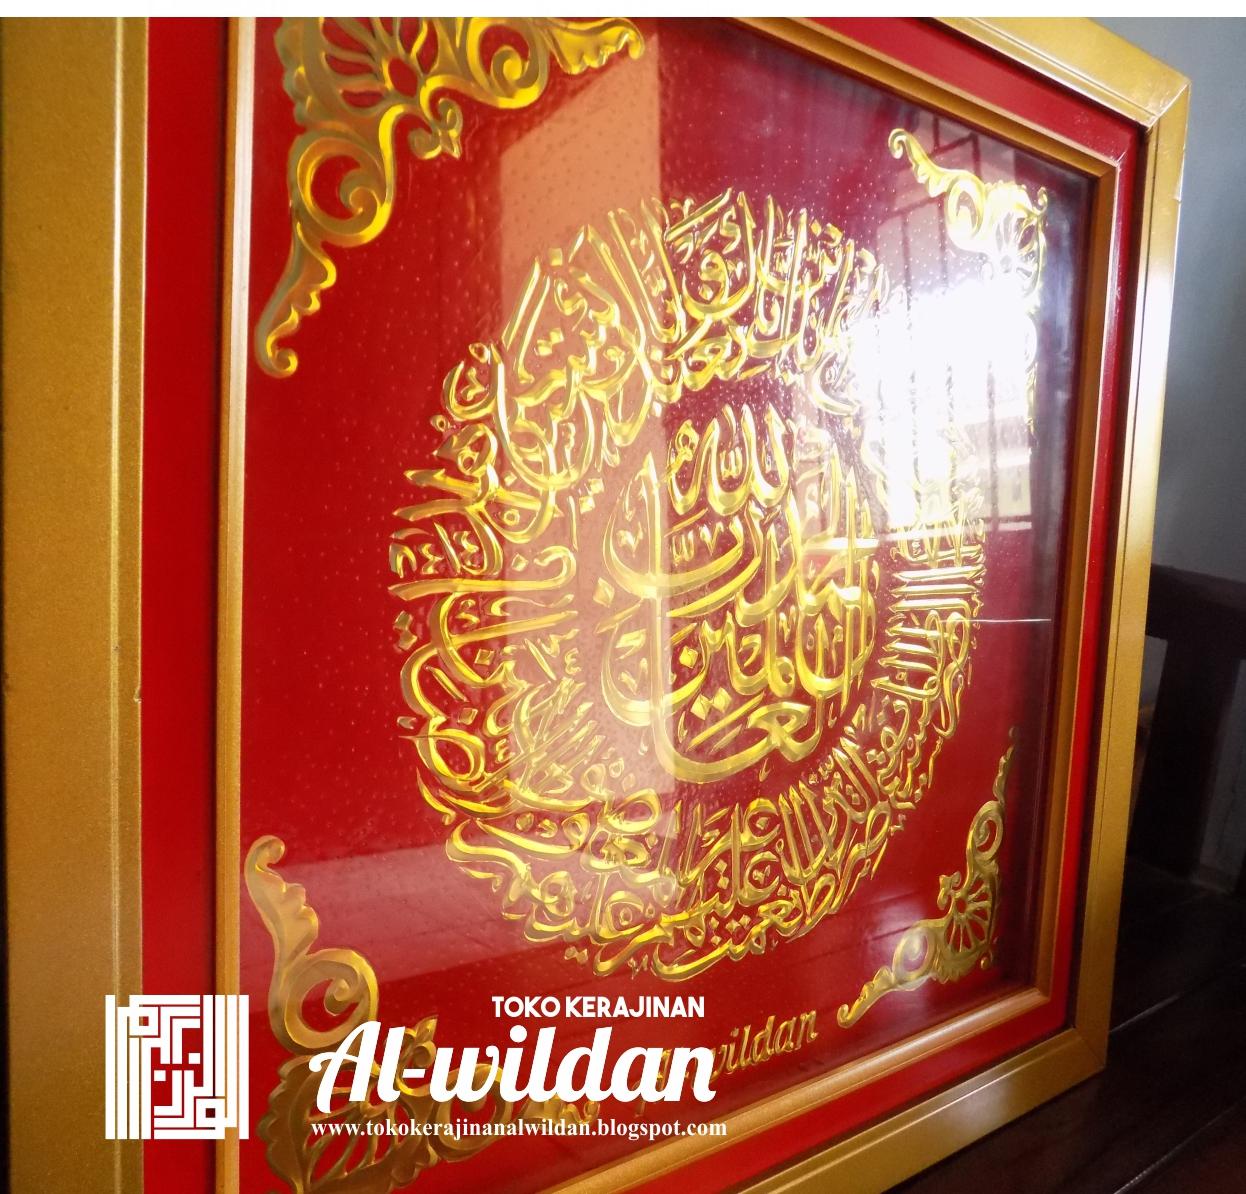 calligraphy, calligraphy font, calligraphy name, calligraphy pen, calligraphy art, calligraphy alphabet, calligraphy arabic, calligraphy letter